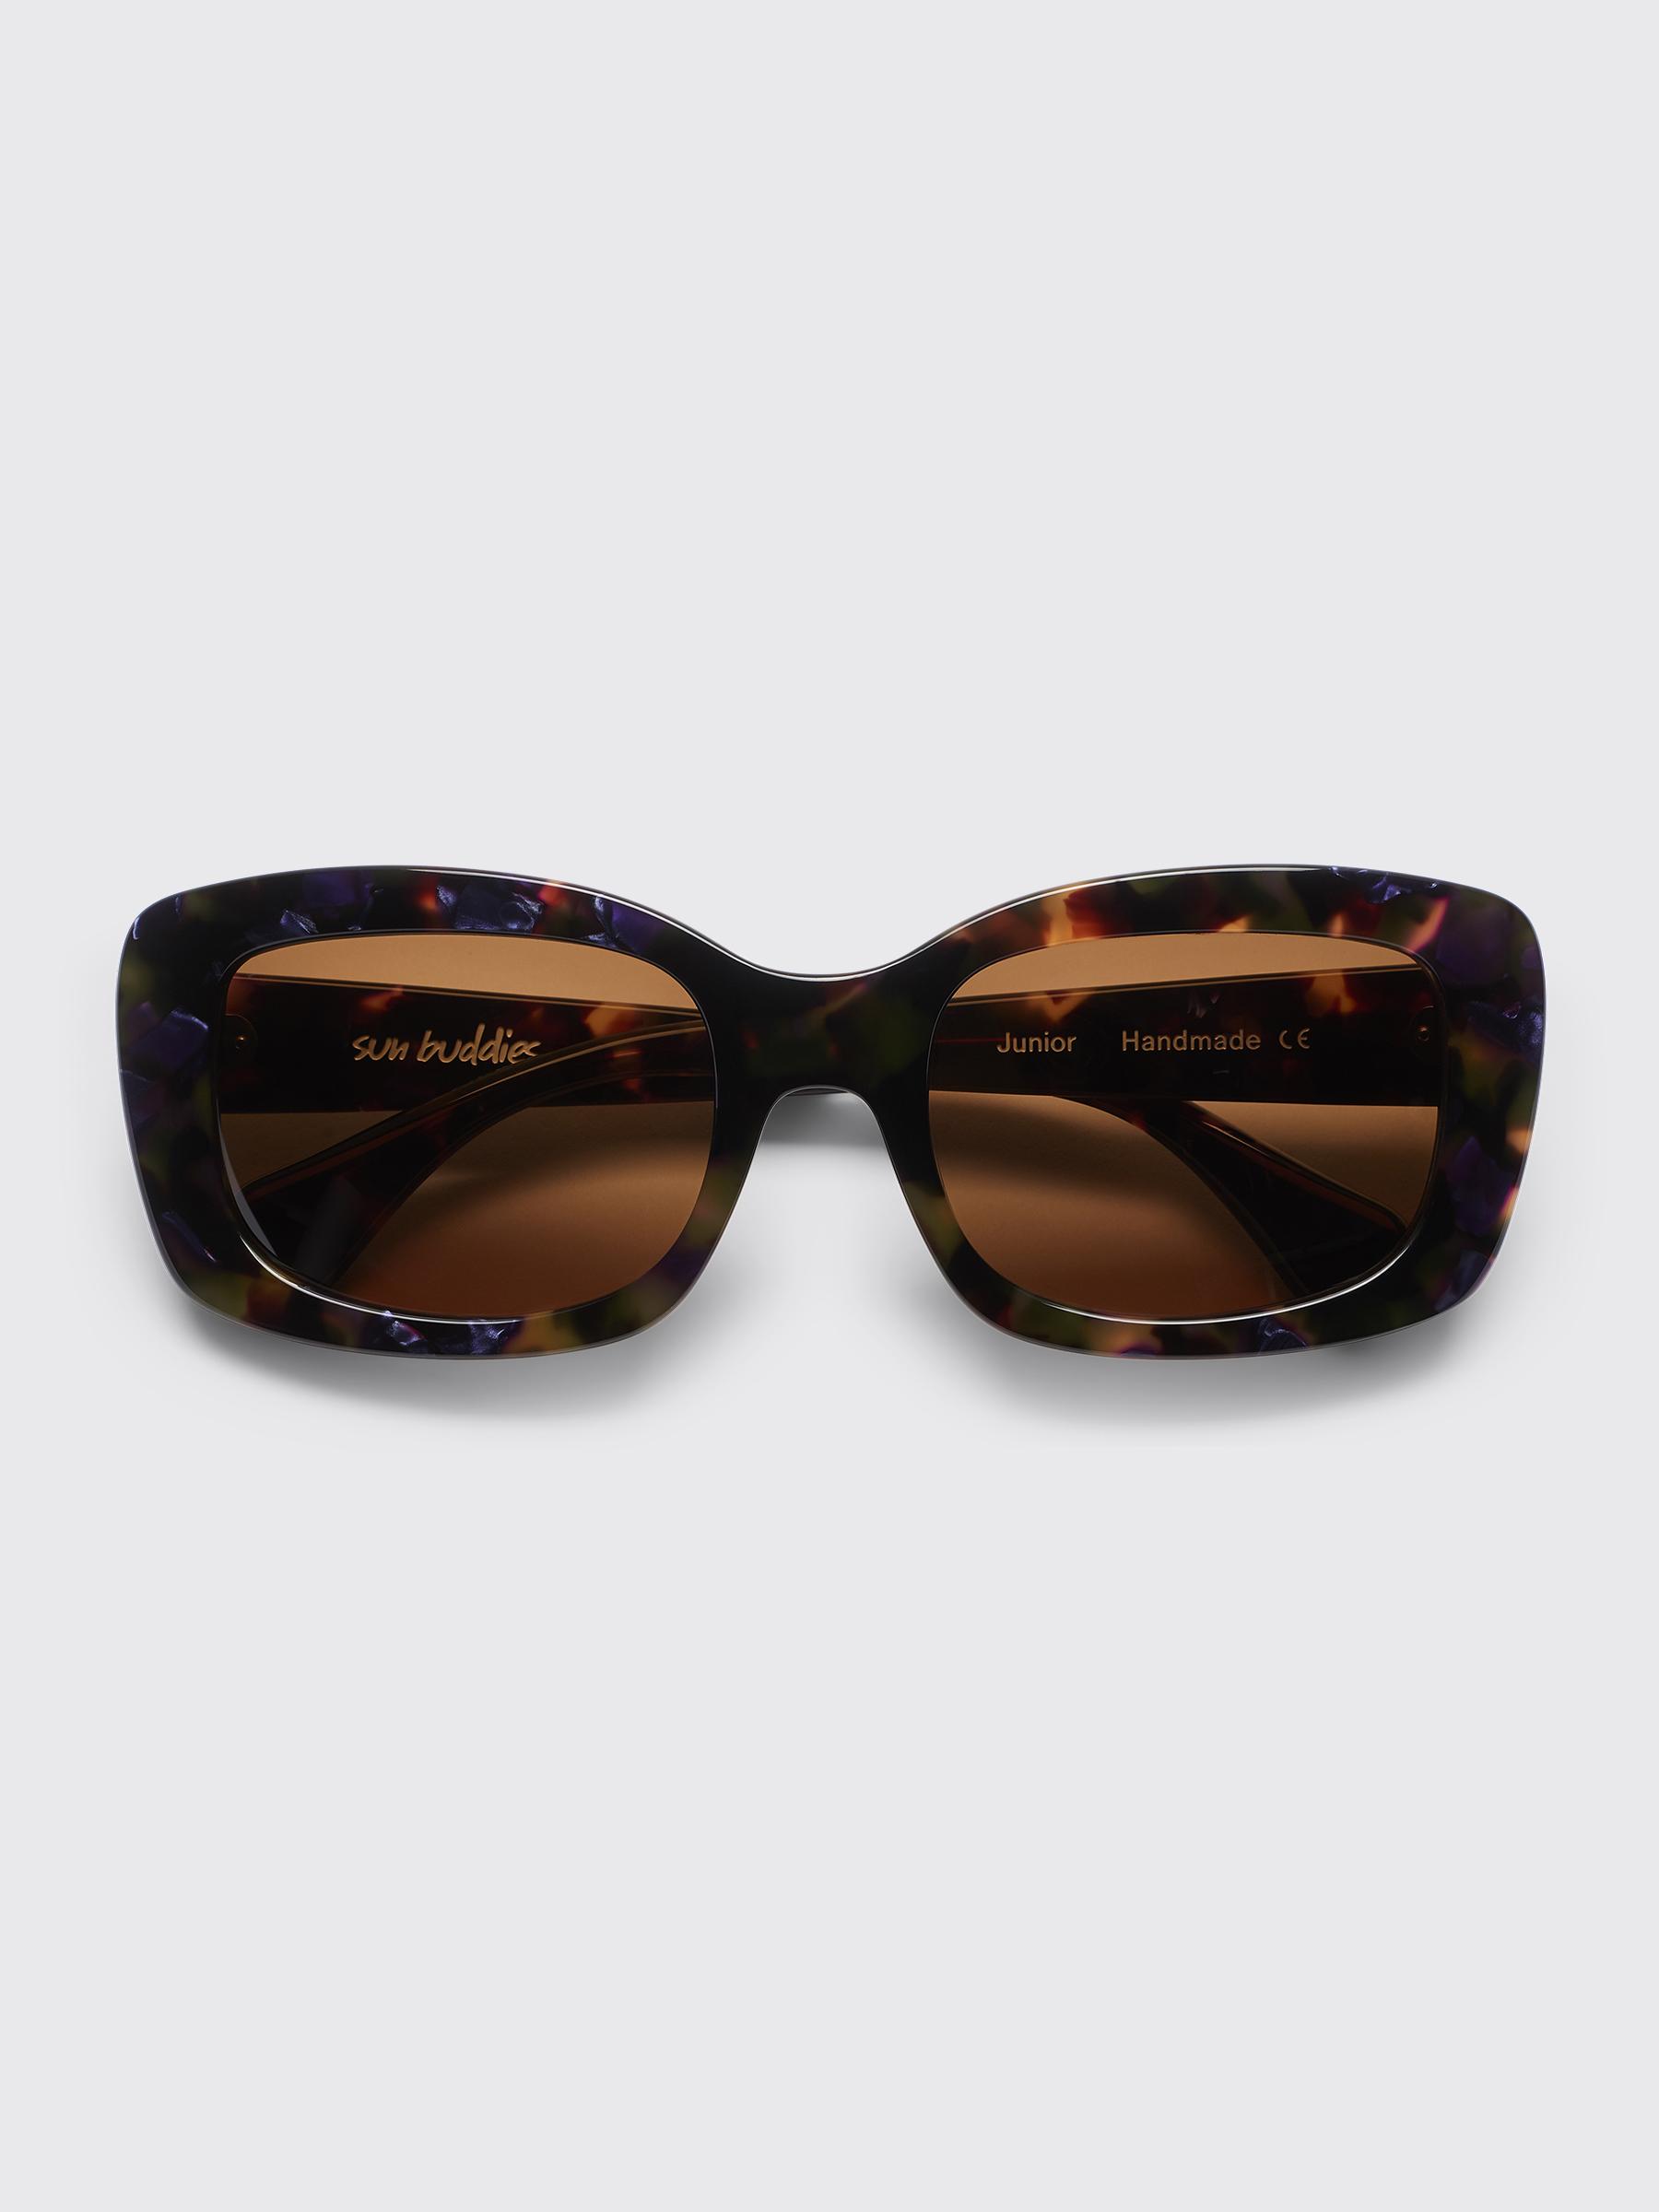 1c3bd5819 Très Bien - Sun Buddies Junior Sunglasses Purple Blonde Tortoise